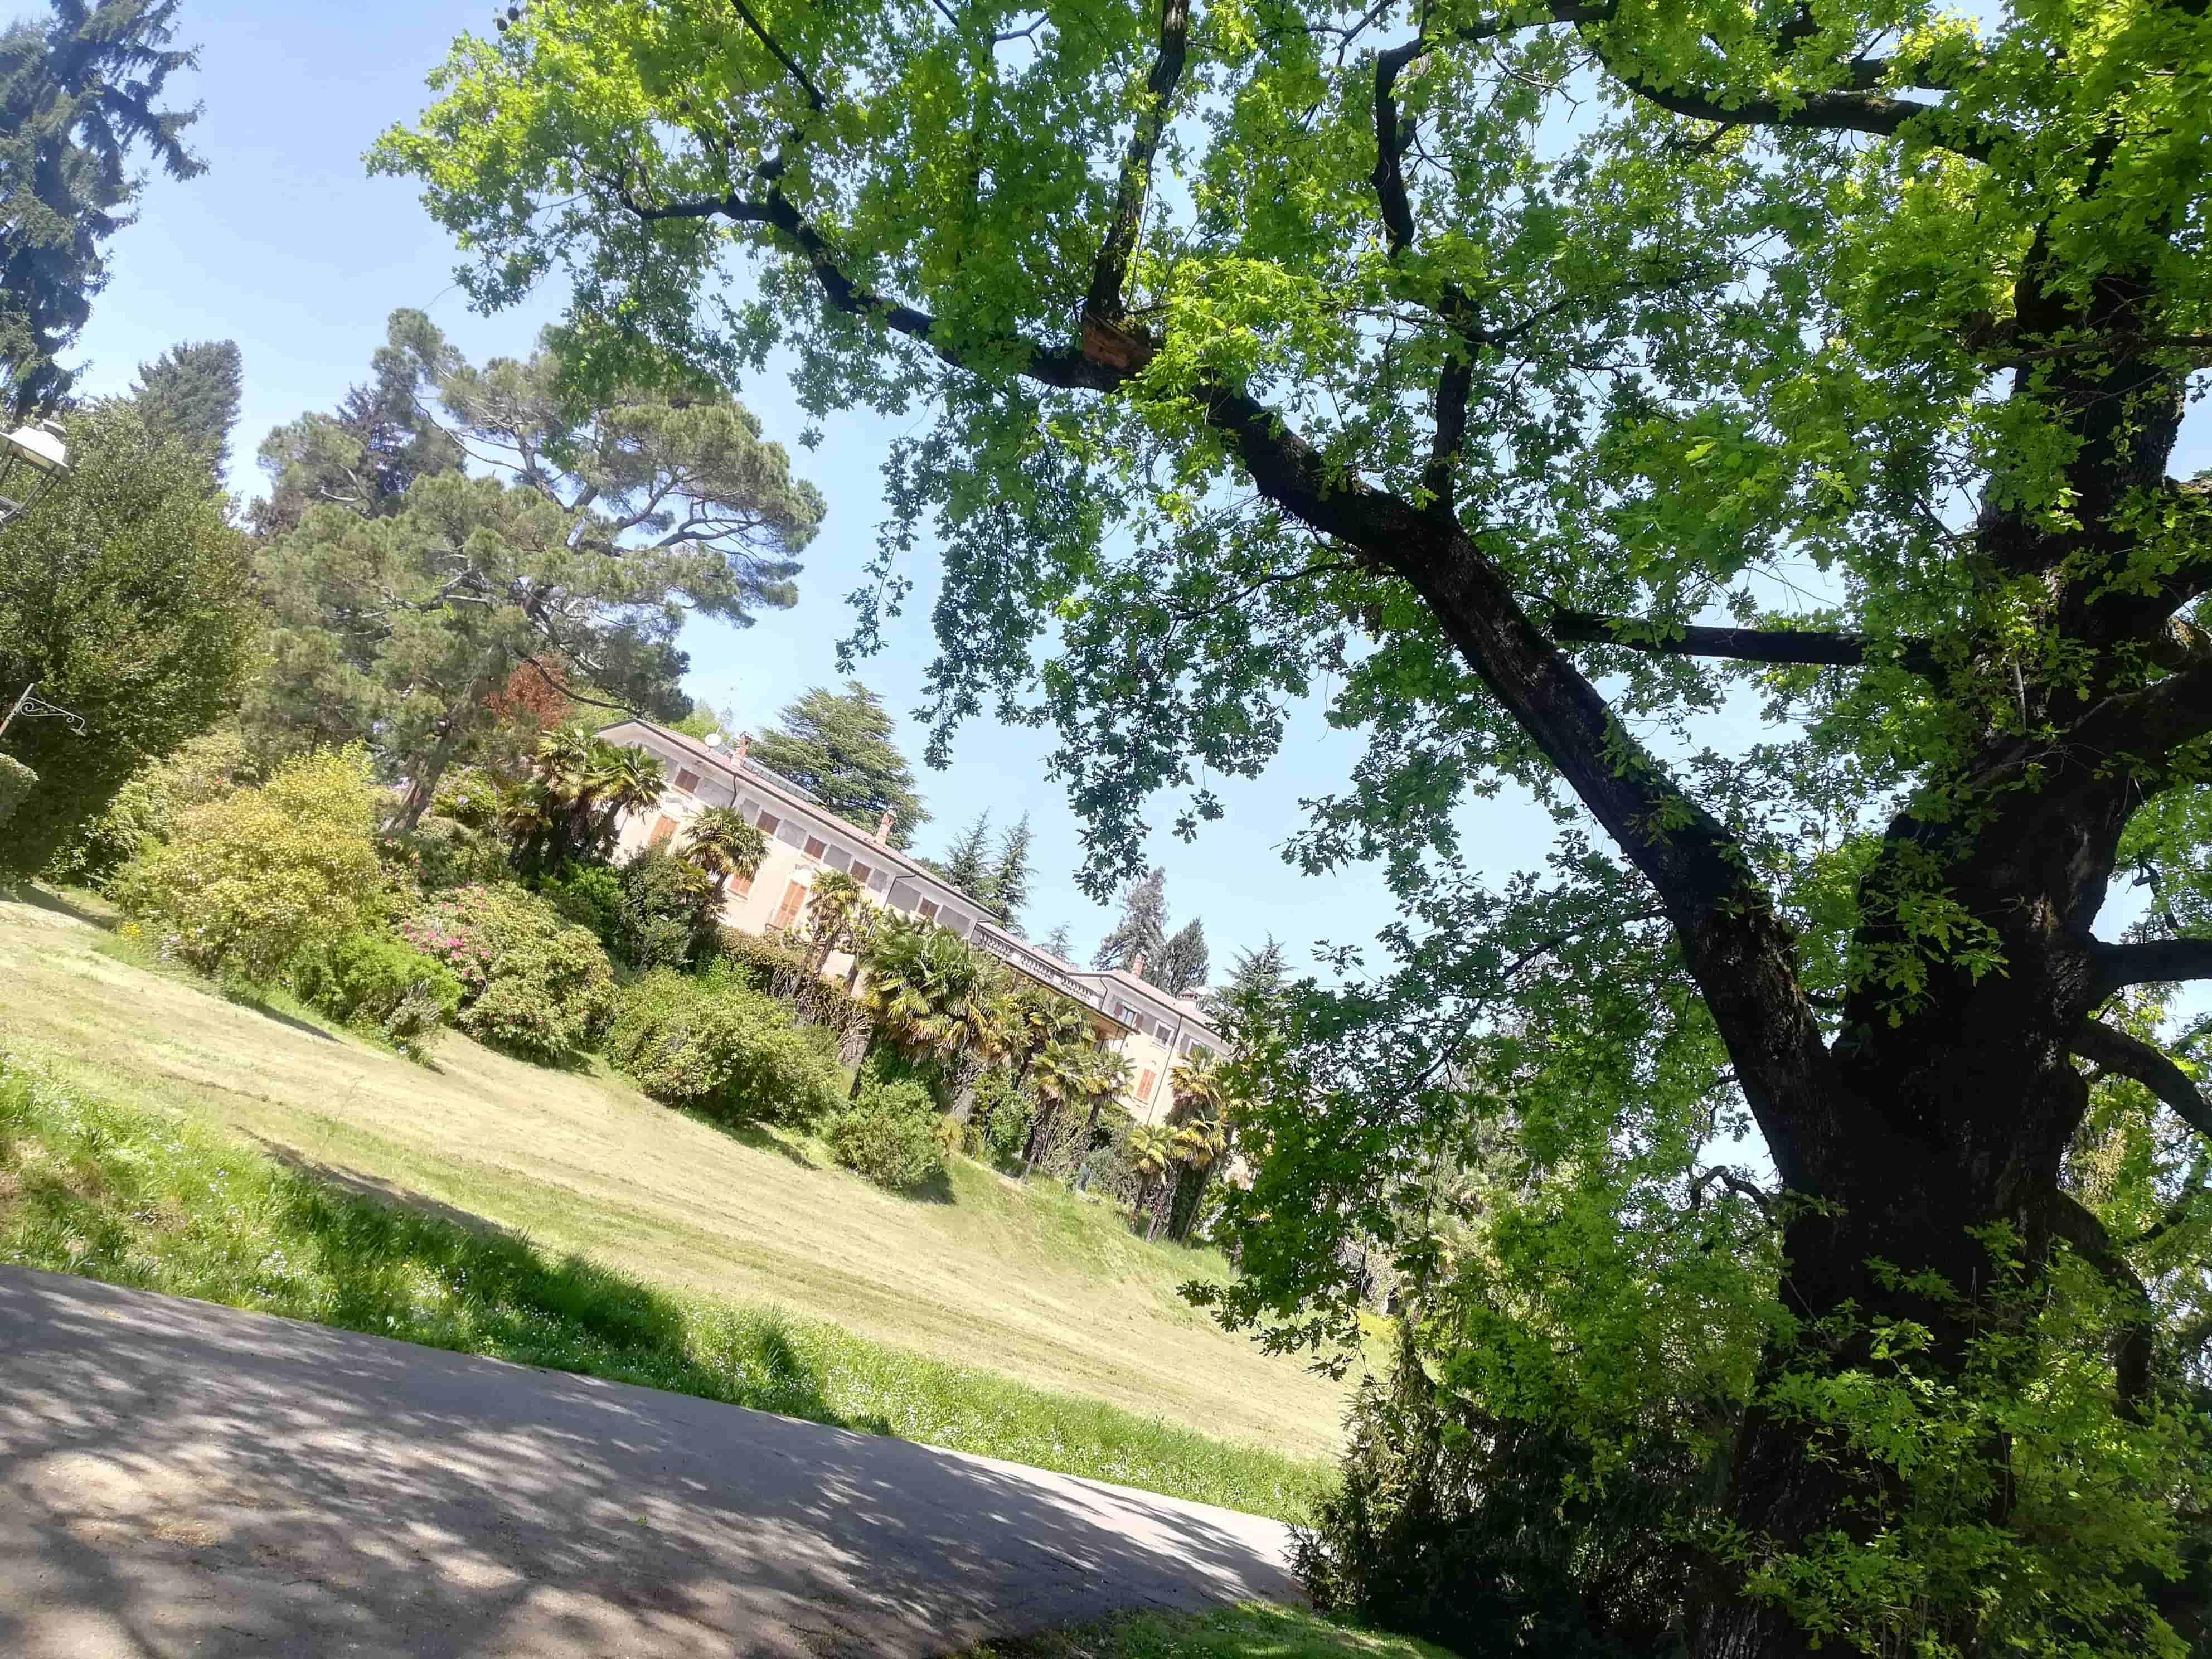 Villa Torelli-Mylius